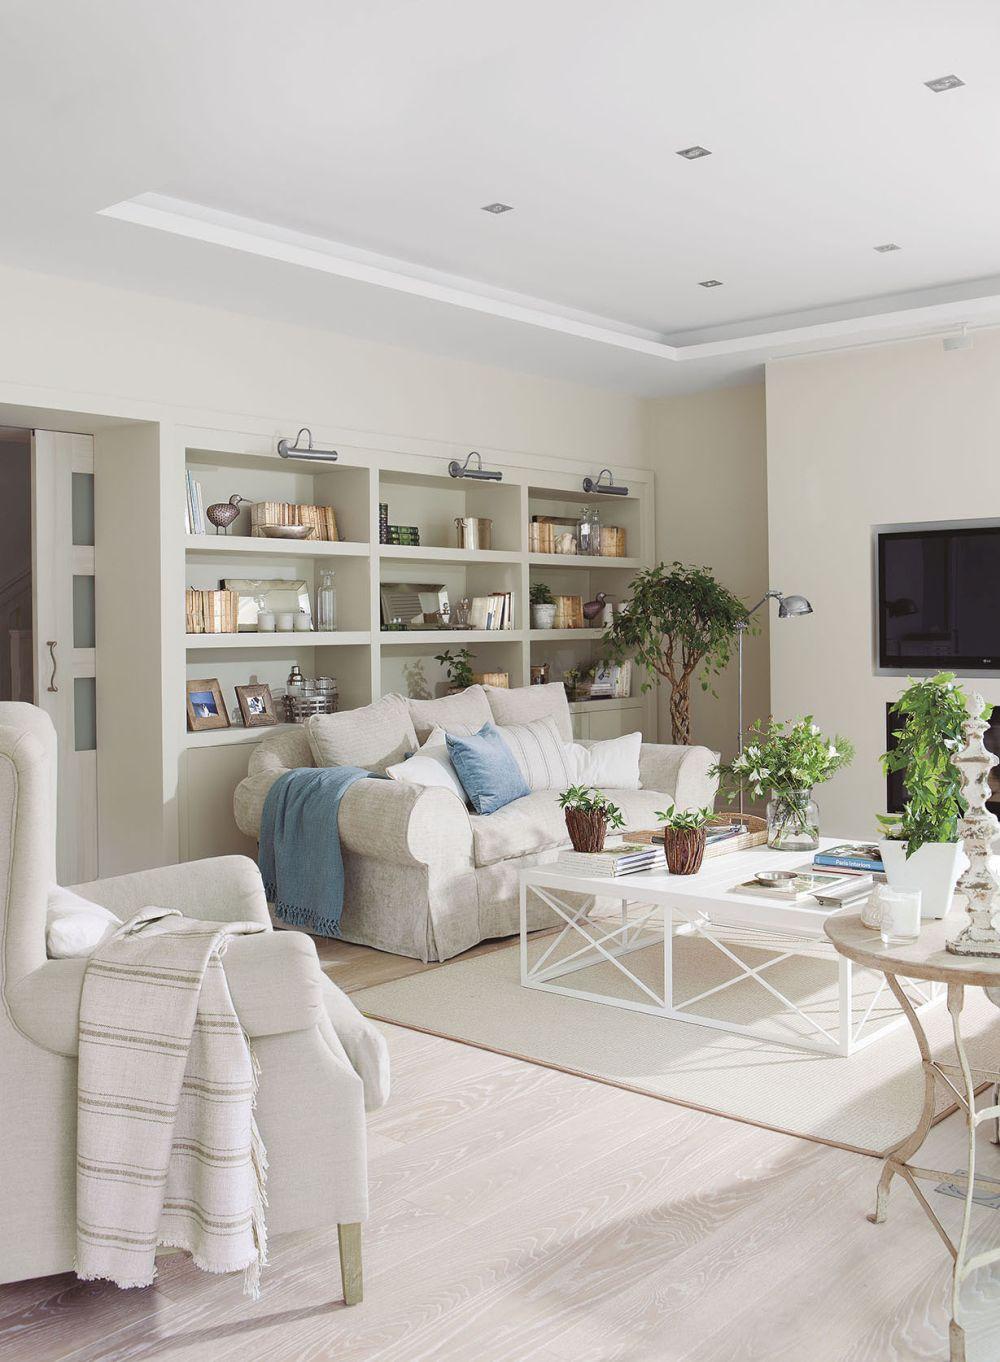 adelaparvu.com despre casa cu interior romantic modern, decorator Asun Anto, arhitect Fernando Agusti (2)